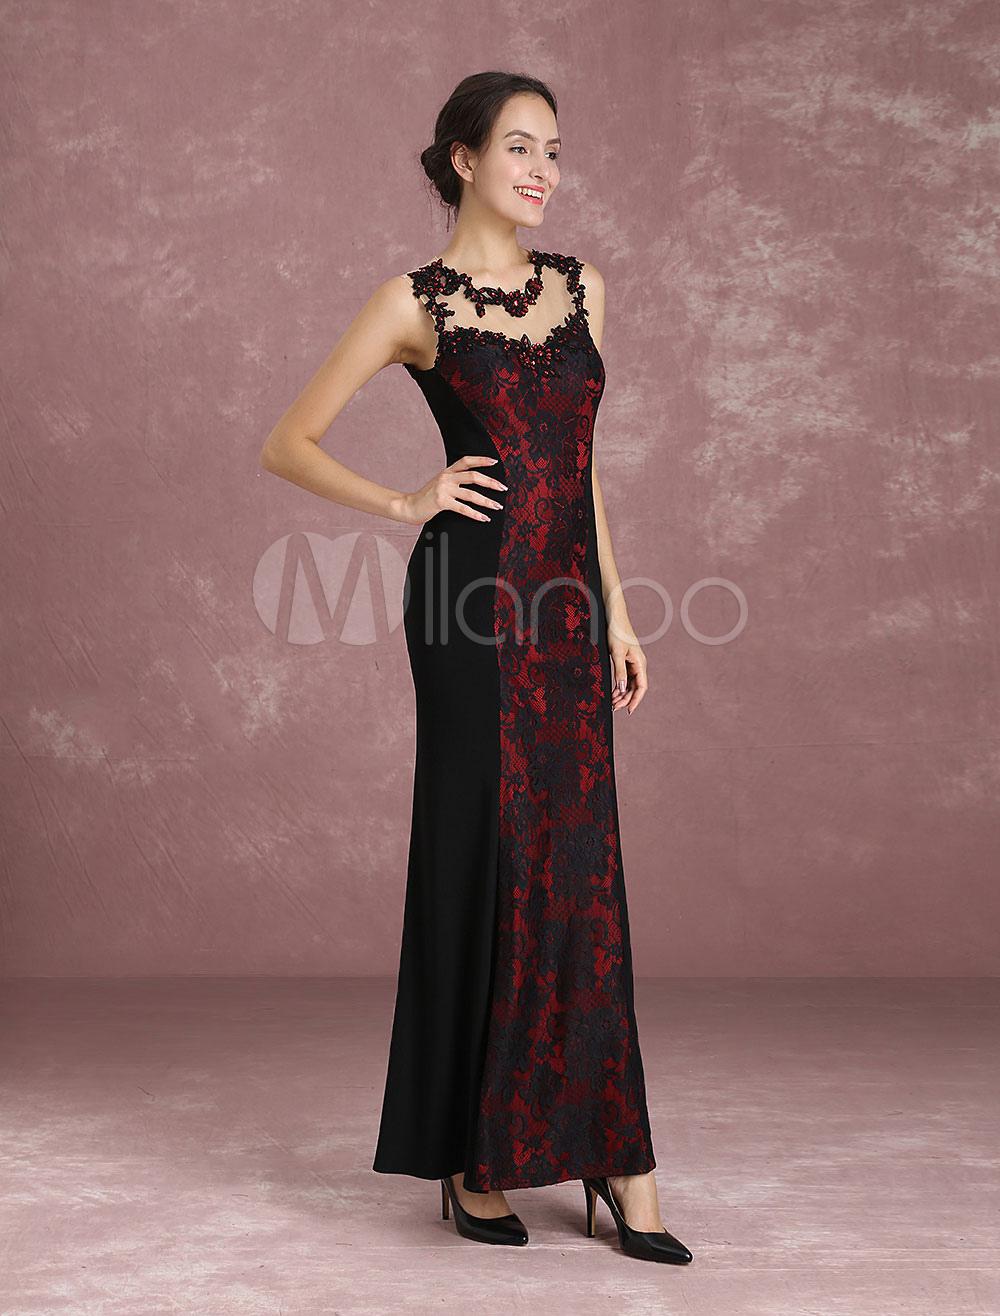 Lace Evening Dresses Illusion Beading Mothers Dress Black Sheath Sleeveless Floor Length Party Dresses (Wedding) photo